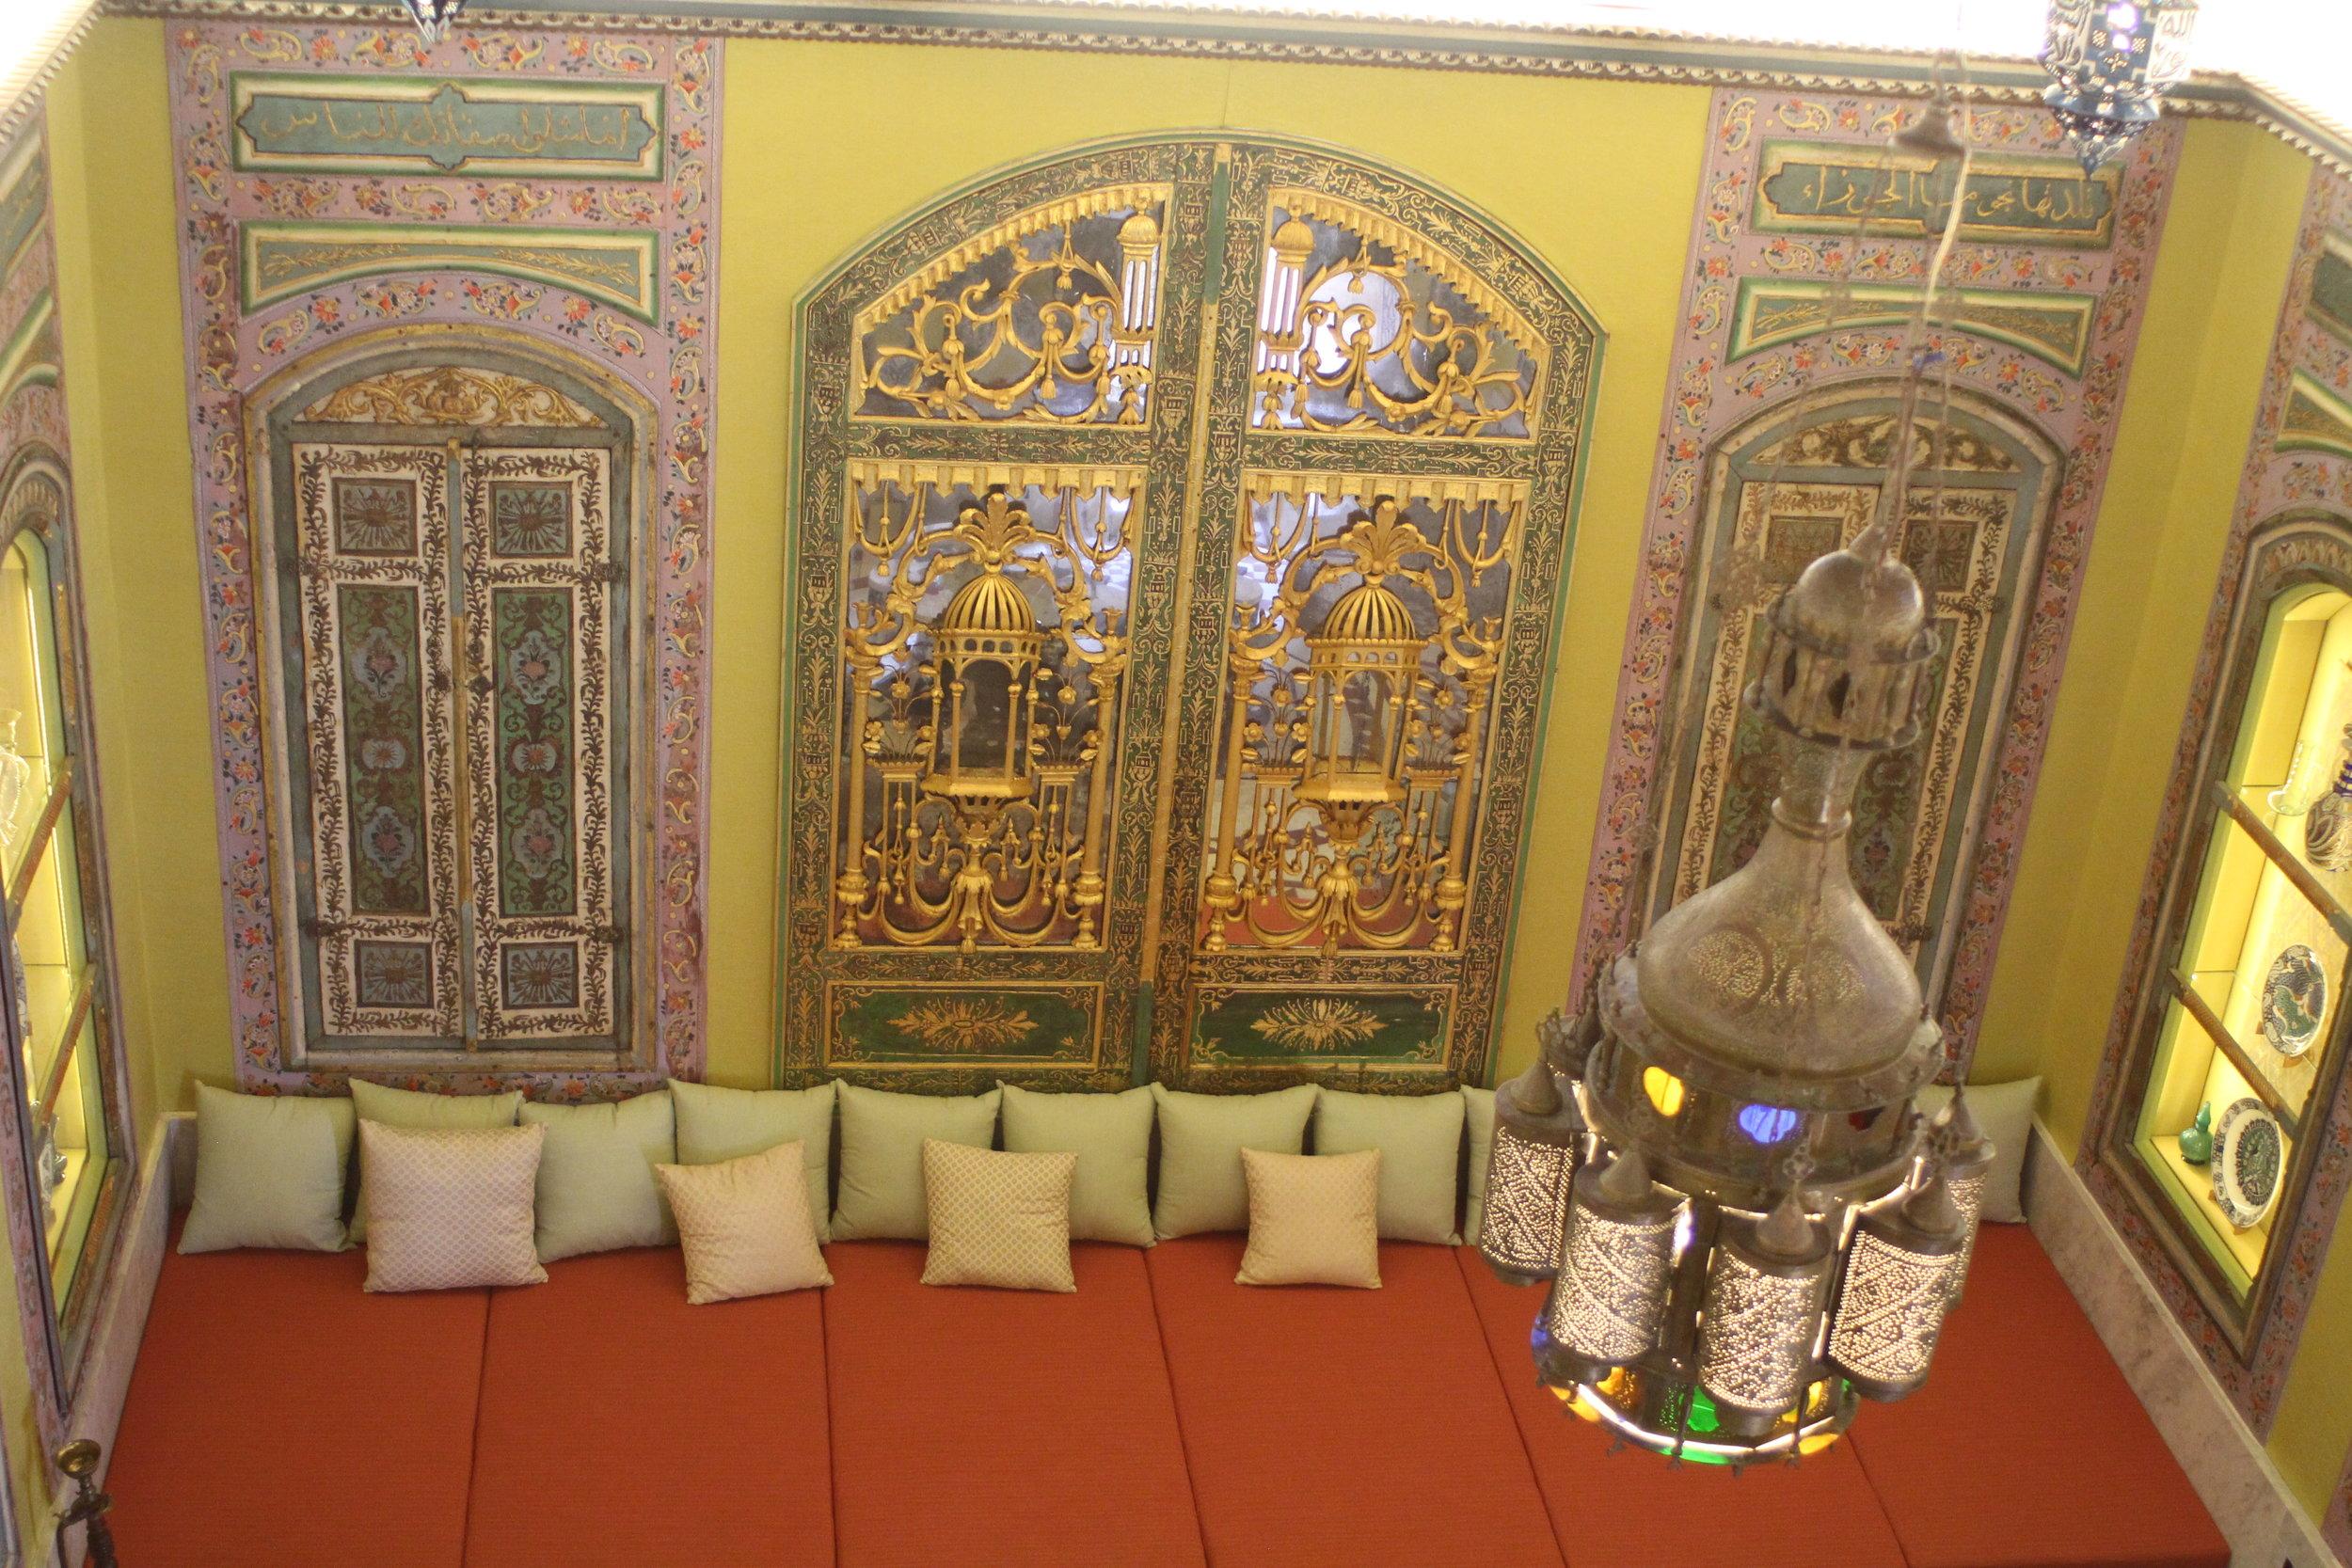 Sitting room at Shangri-La (photo: Brent Petersen)